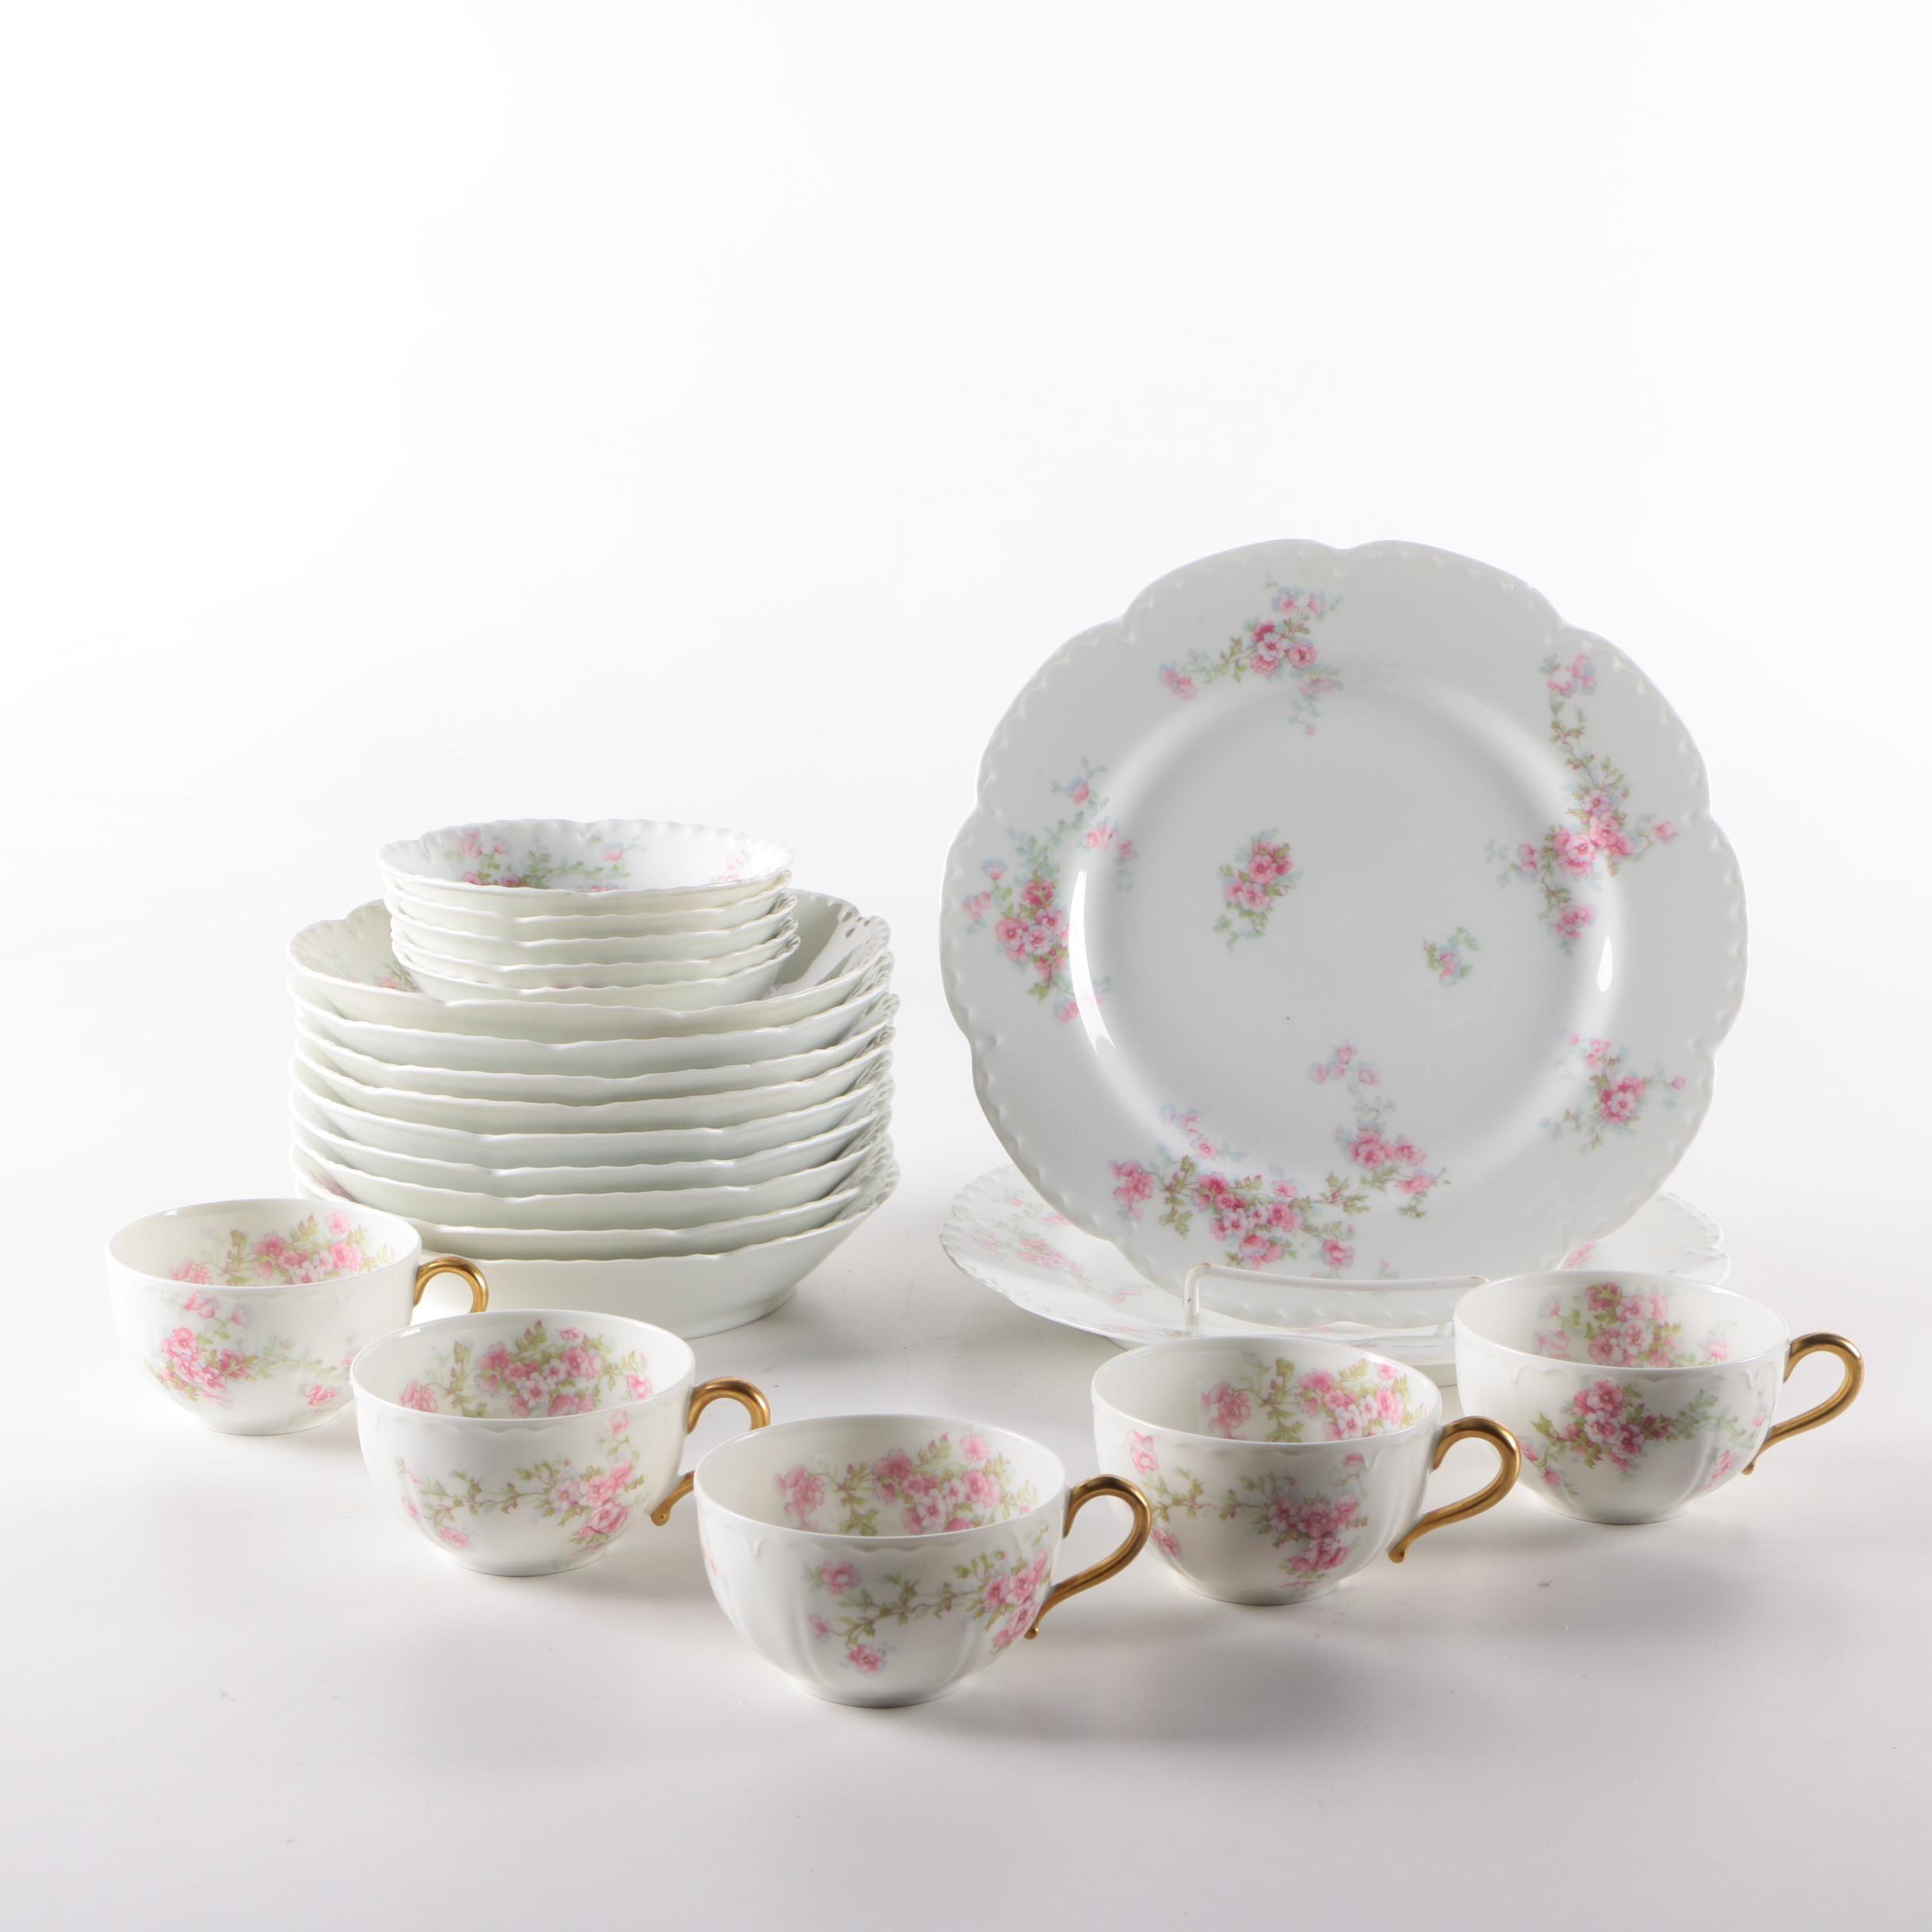 Circa 1910s Haviland & Co. Limoges Porcelain Tableware